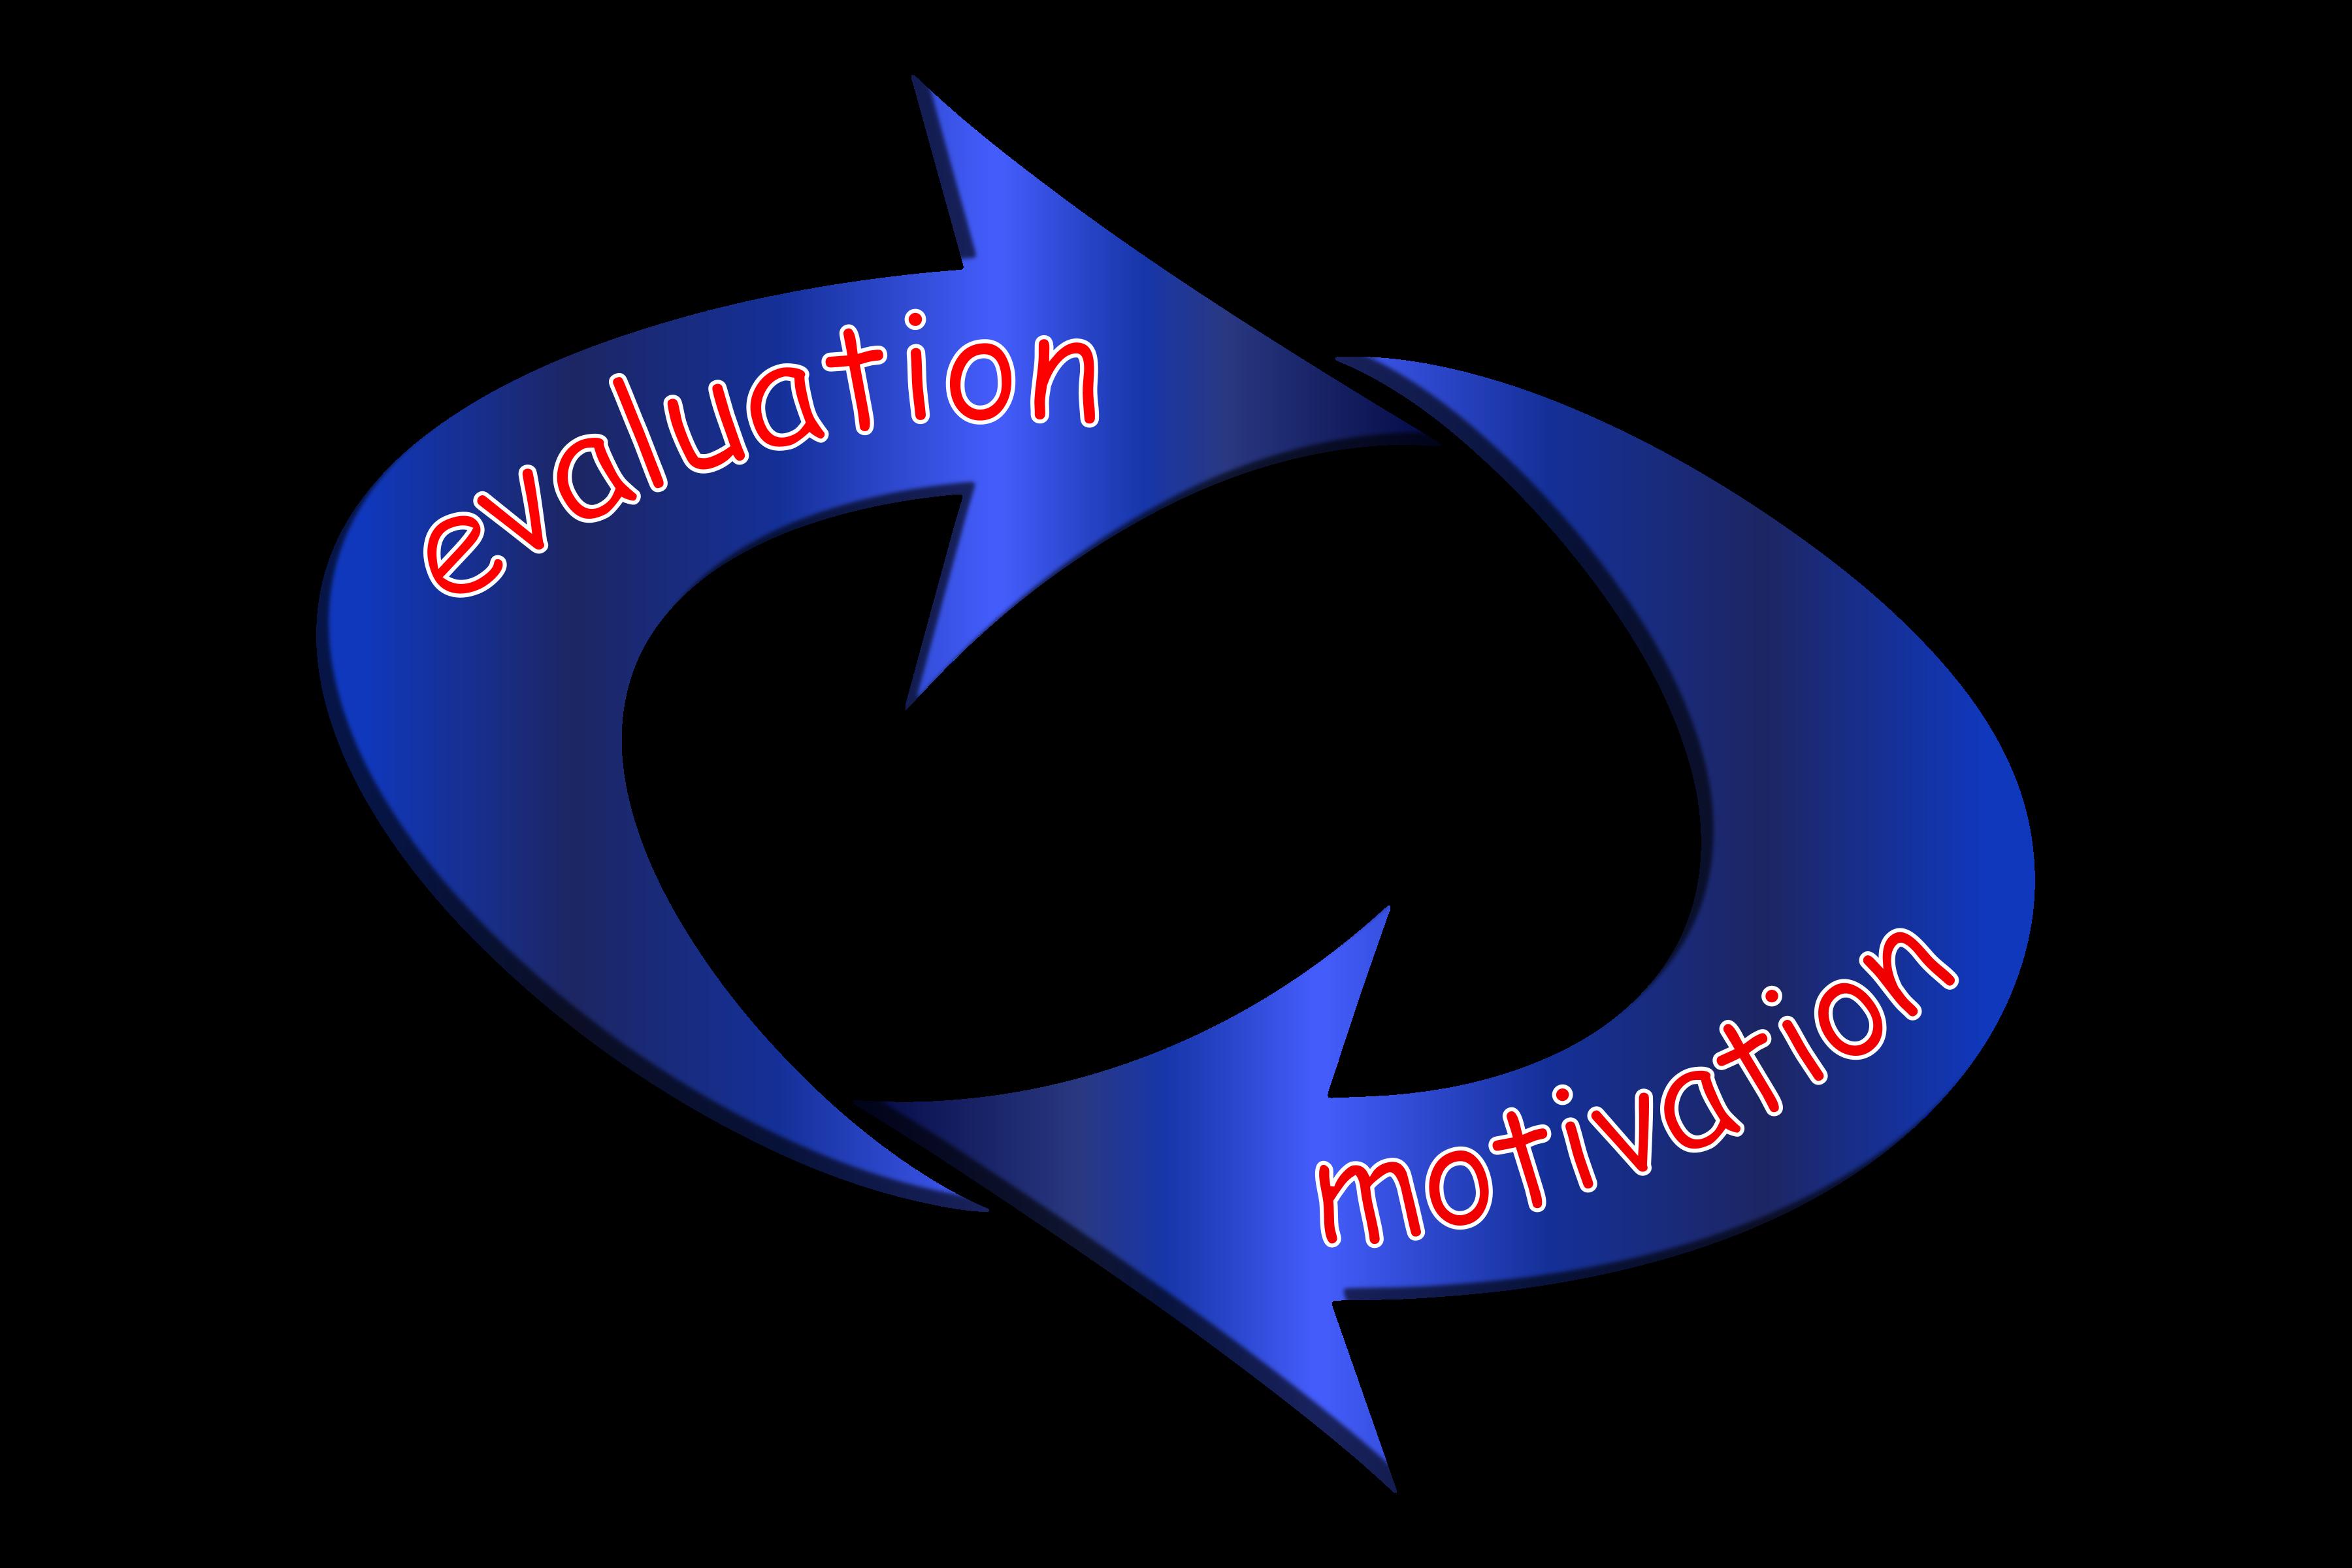 banner royalty free download Evaluation loop big image. Motivation clipart.